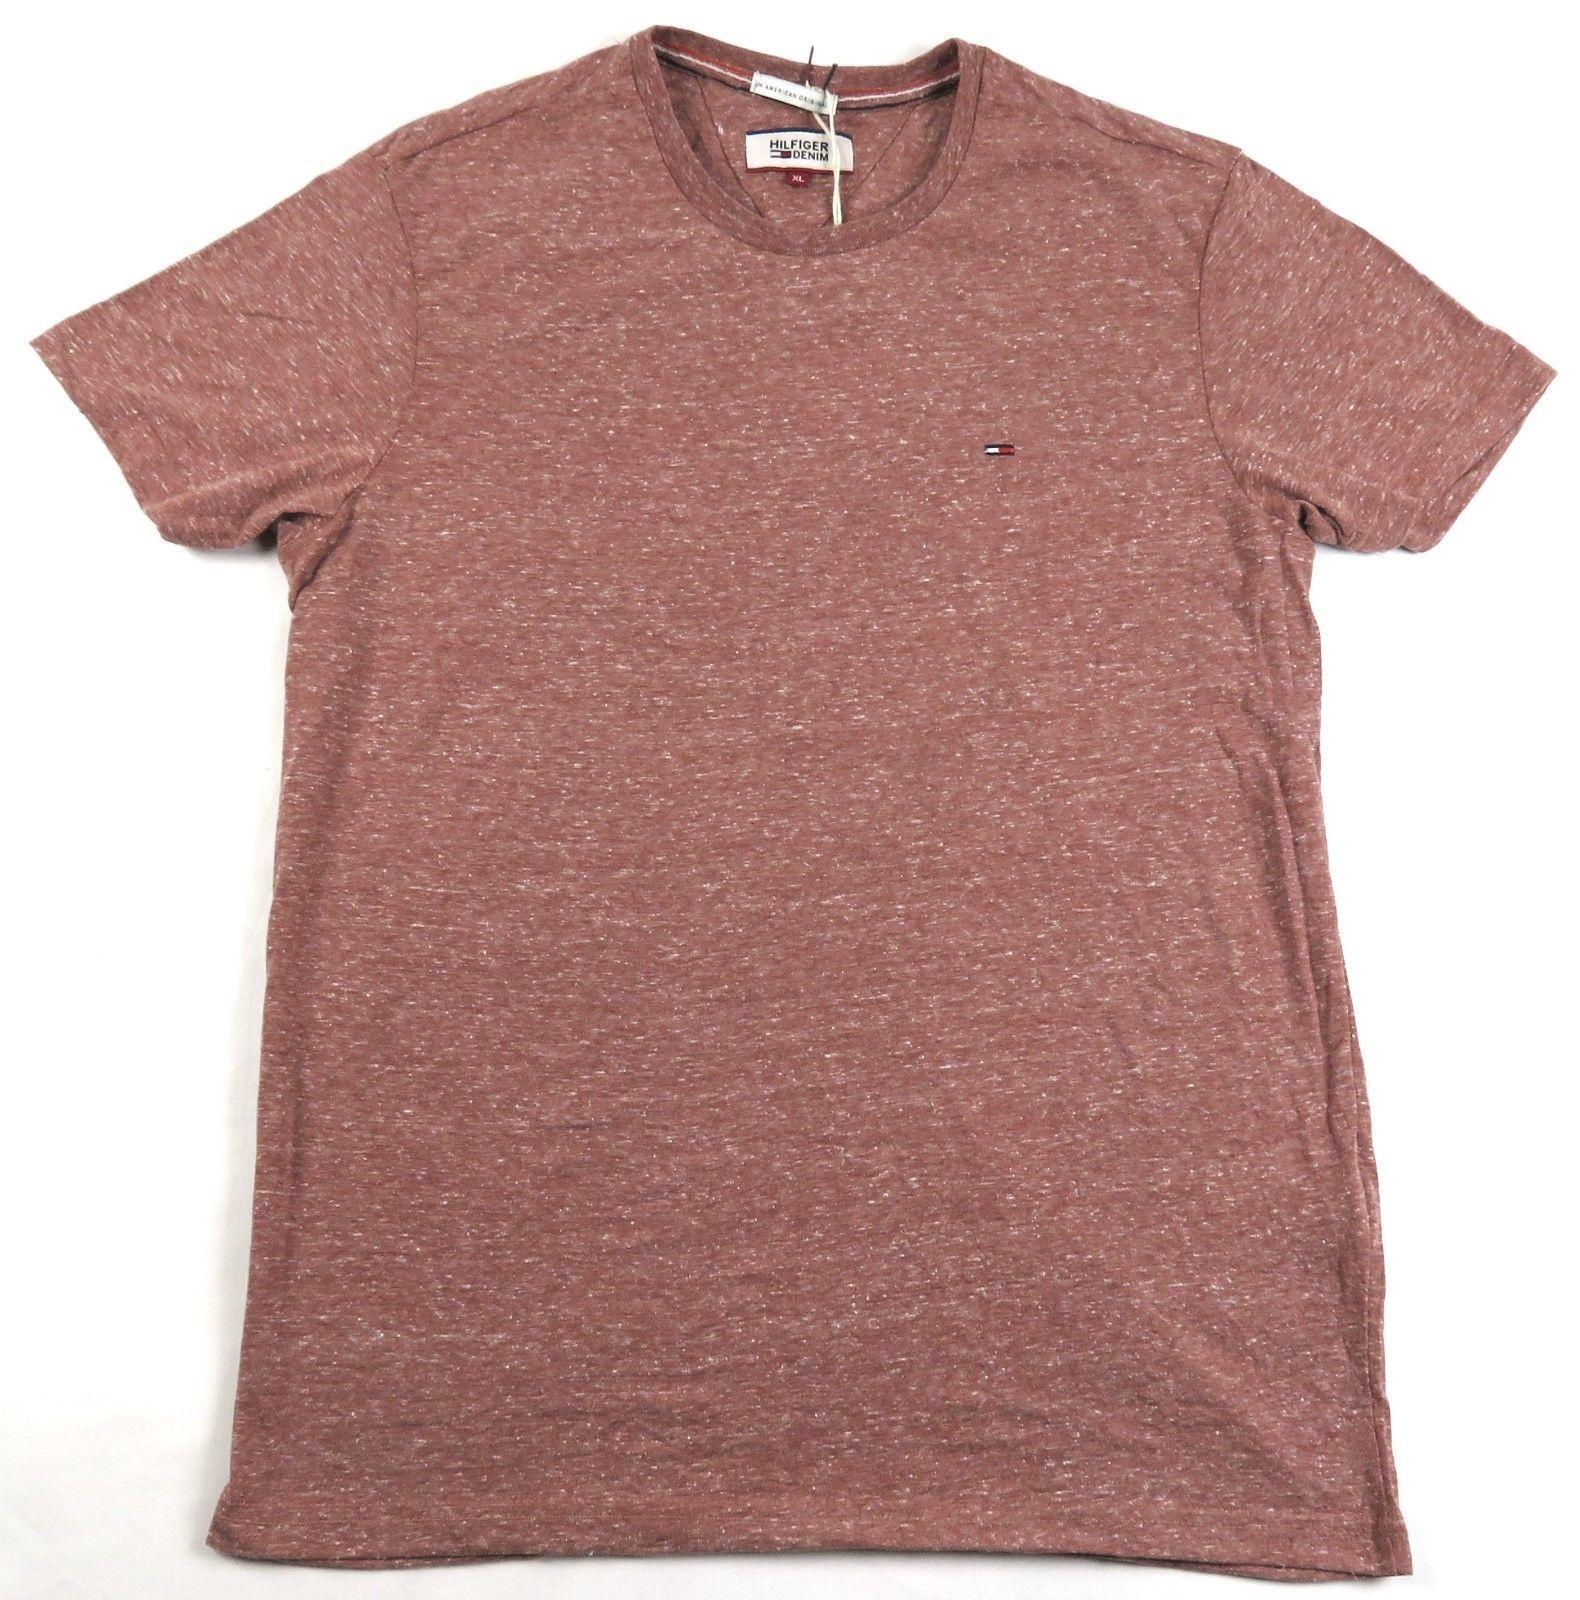 Tommy Hilfiger Denim Men's Shirt Original Basic Knit Crew Neck Tee Deep Red